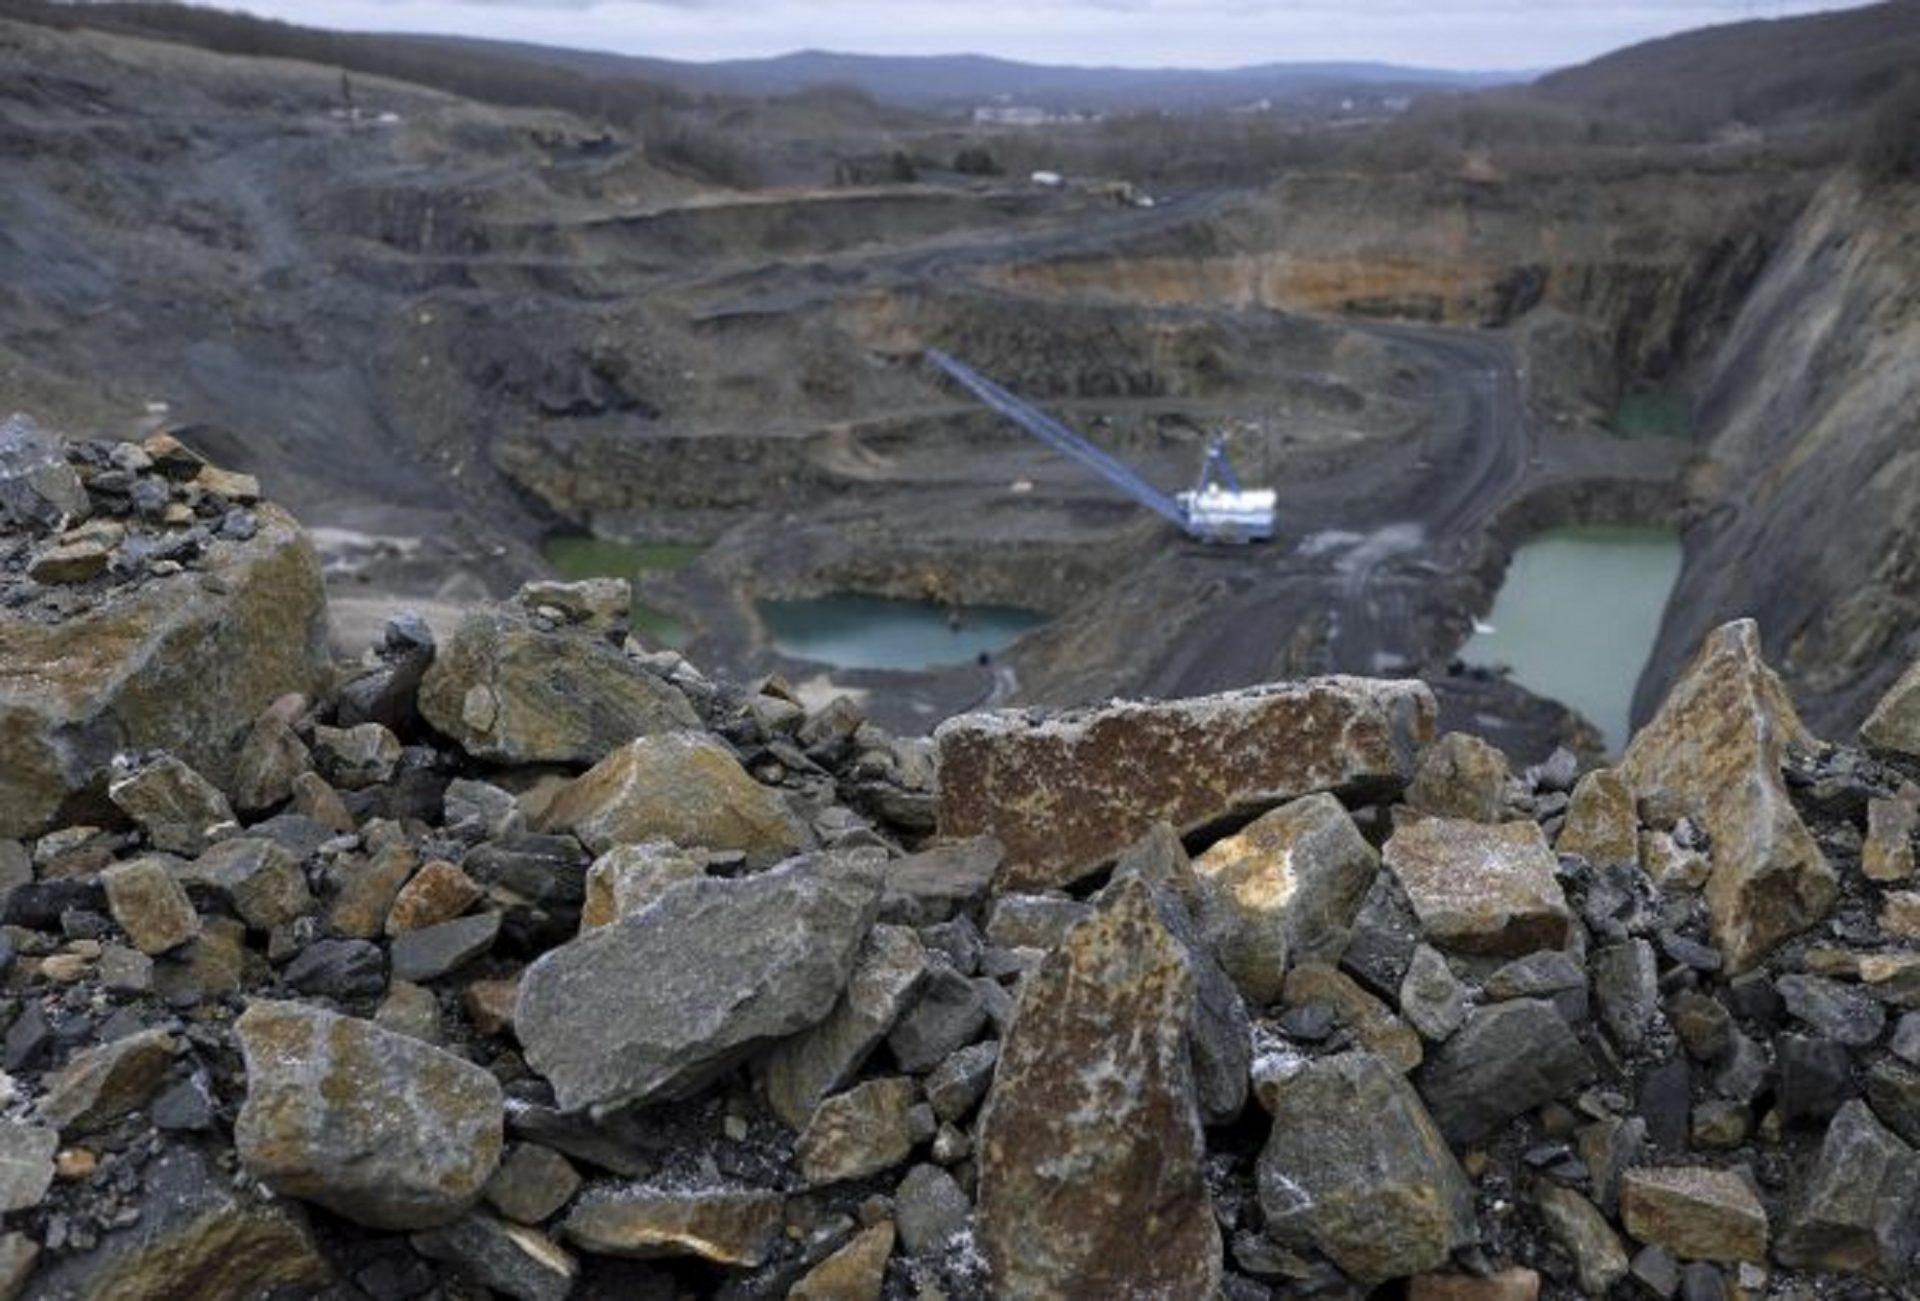 A view of Blaschak coal mine in Mahanoy City